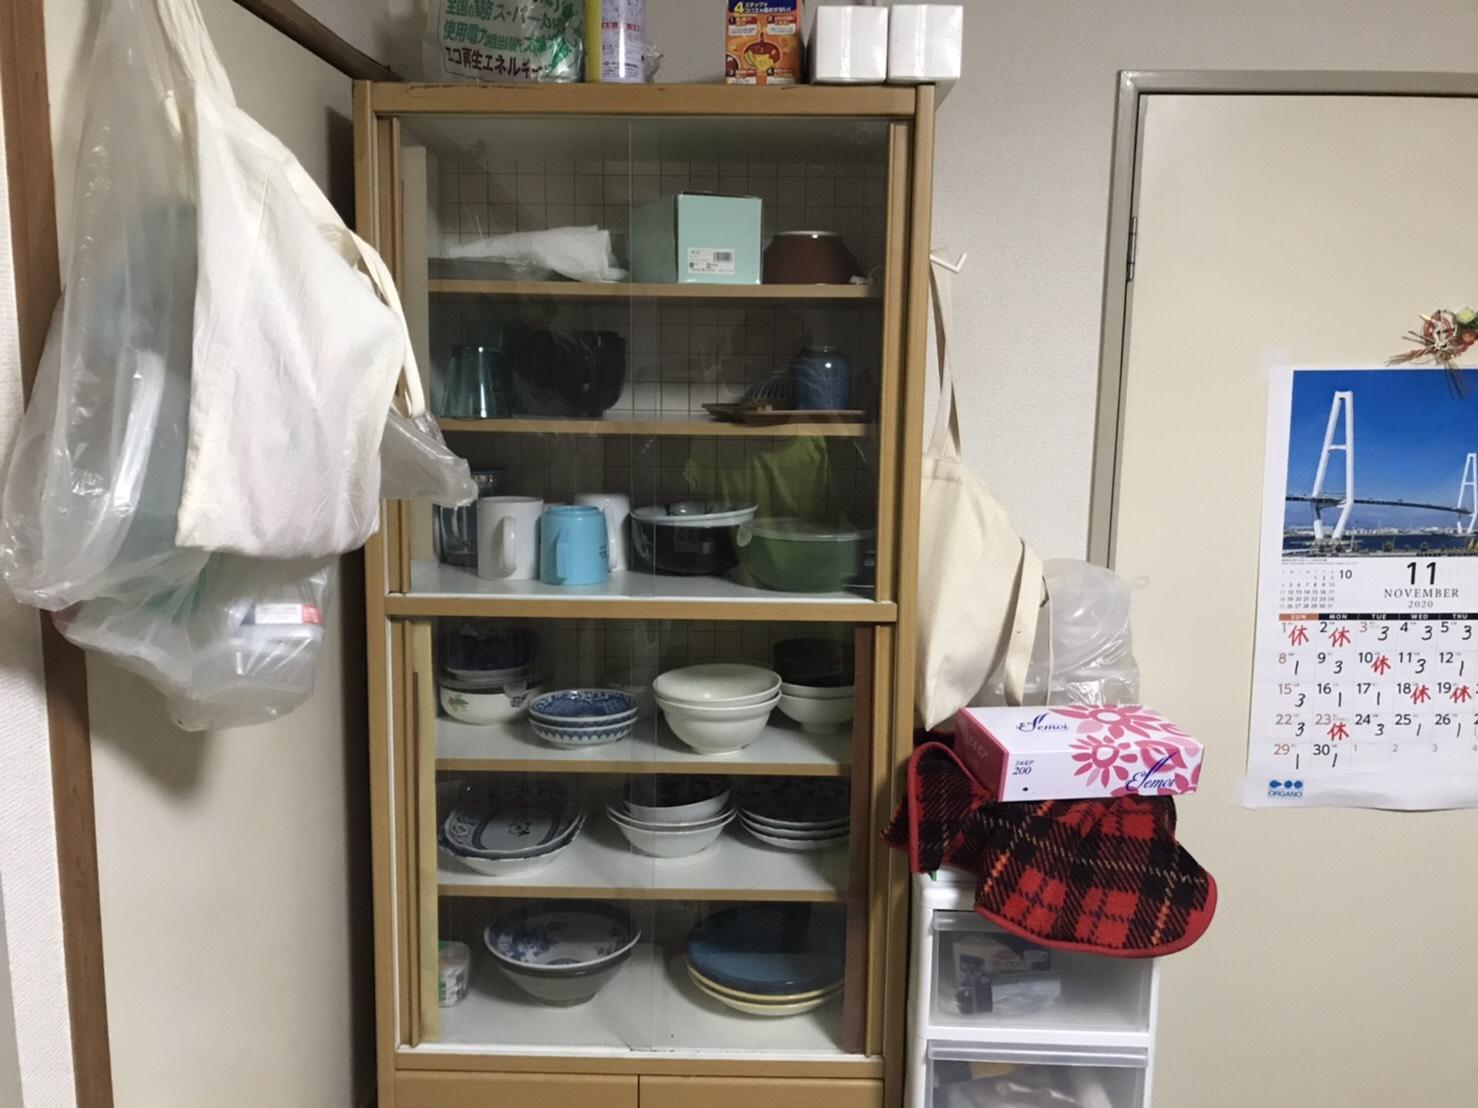 食器棚、食器の回収前